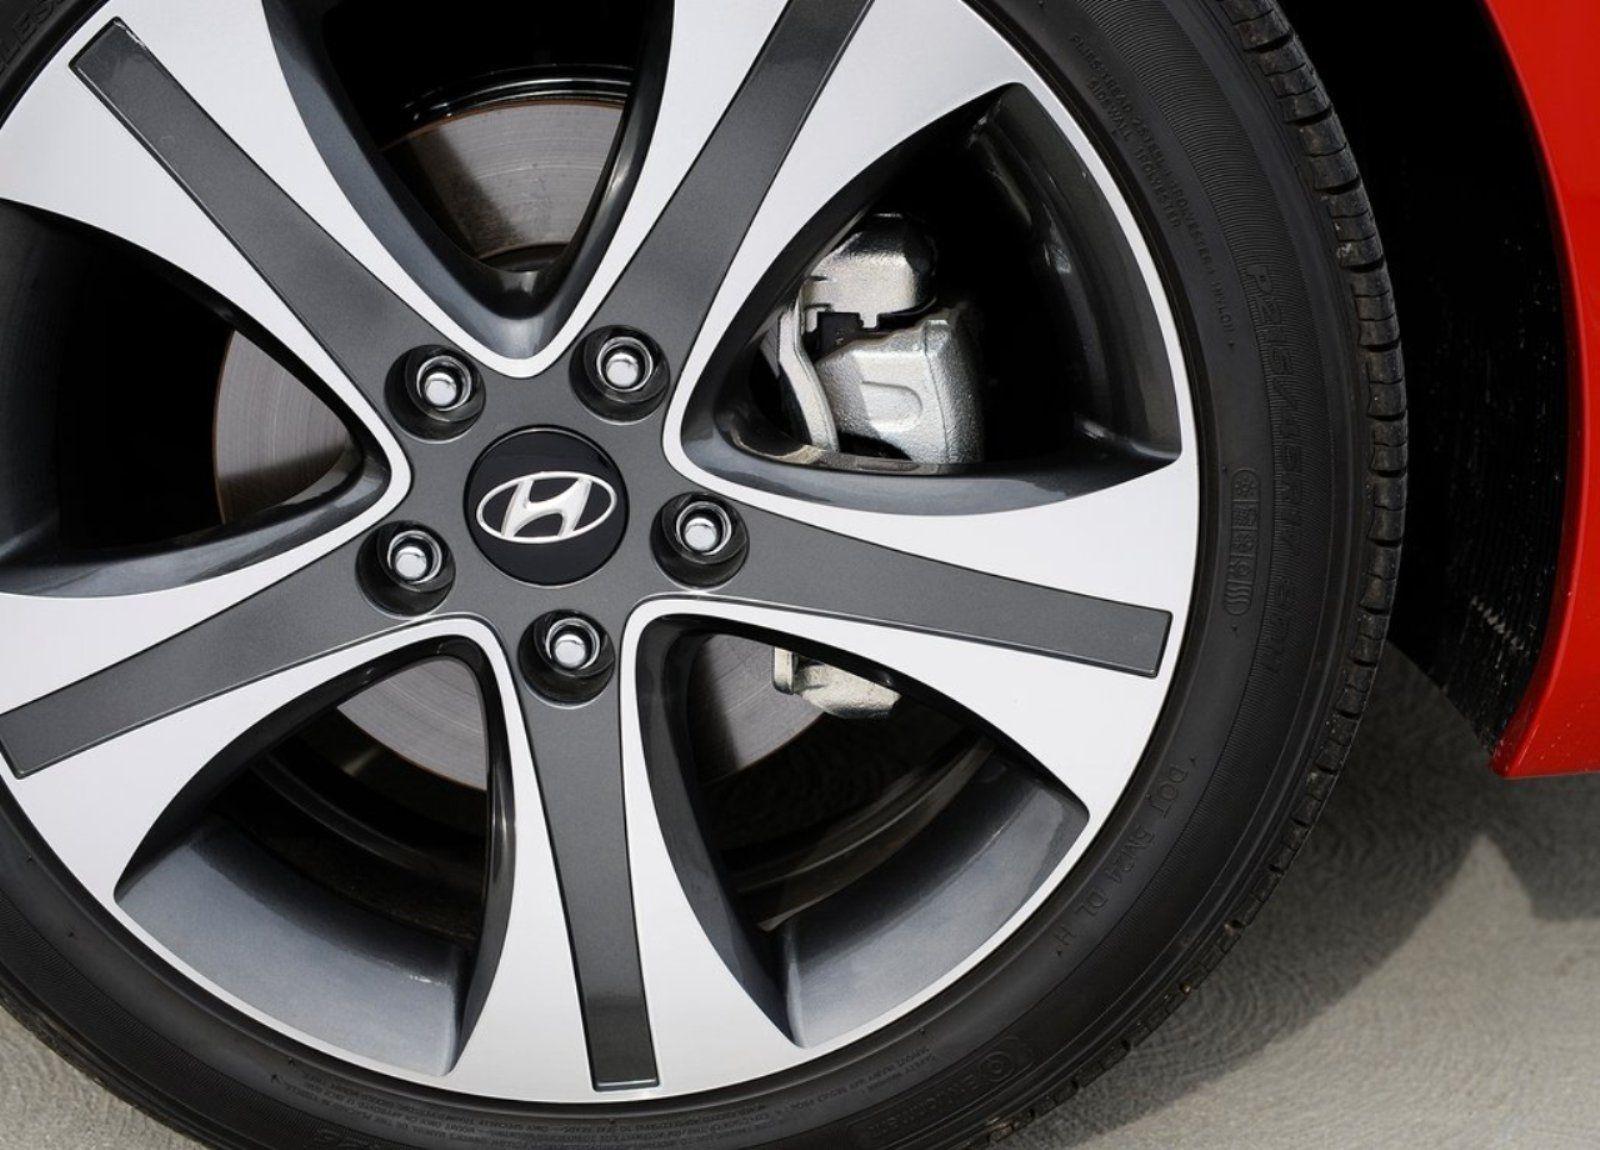 Wheels For All Cars Elantra Hyundai Elantra Elantra Coupe